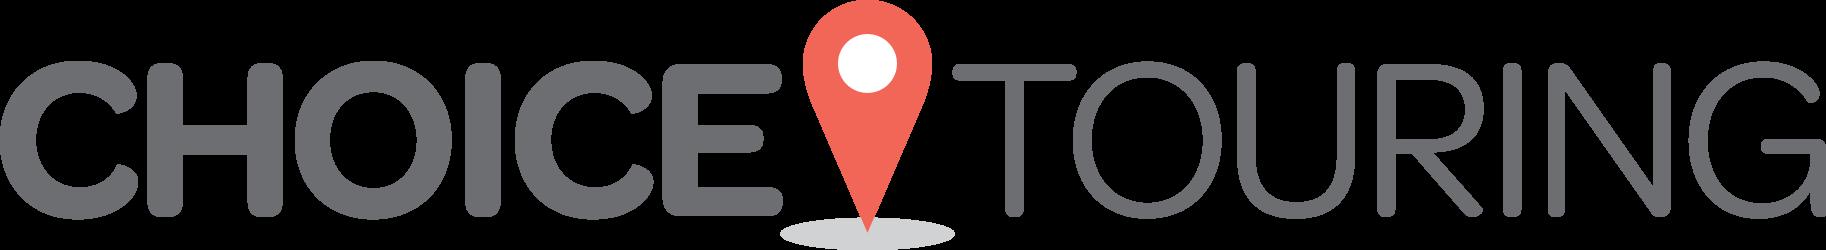 Choice_Touring_Logo